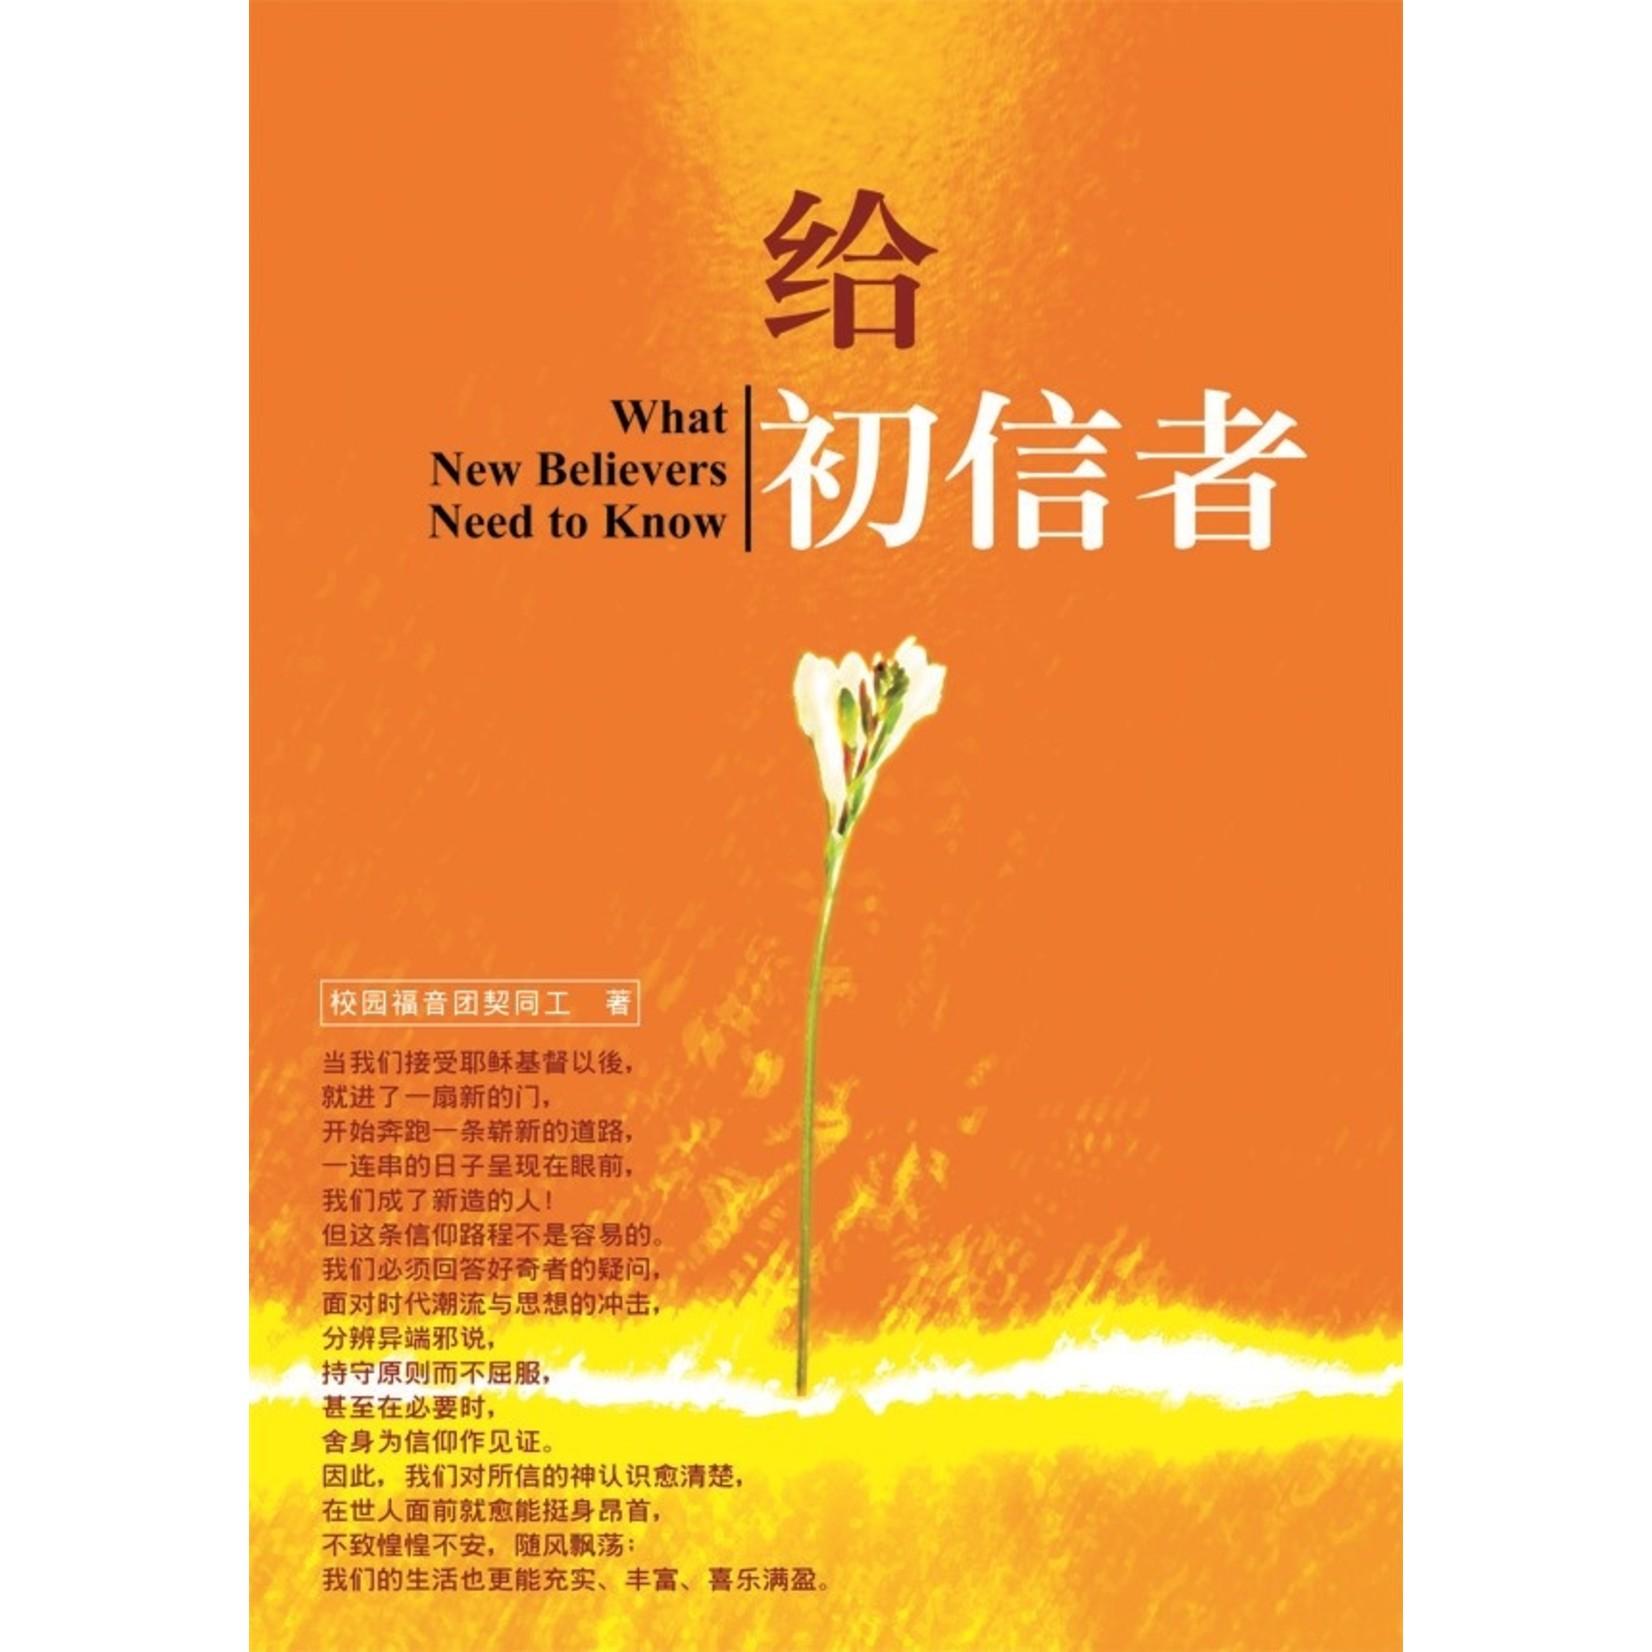 校園書房 Campus Books 給初信者(繁體) What New Believers Need to Know